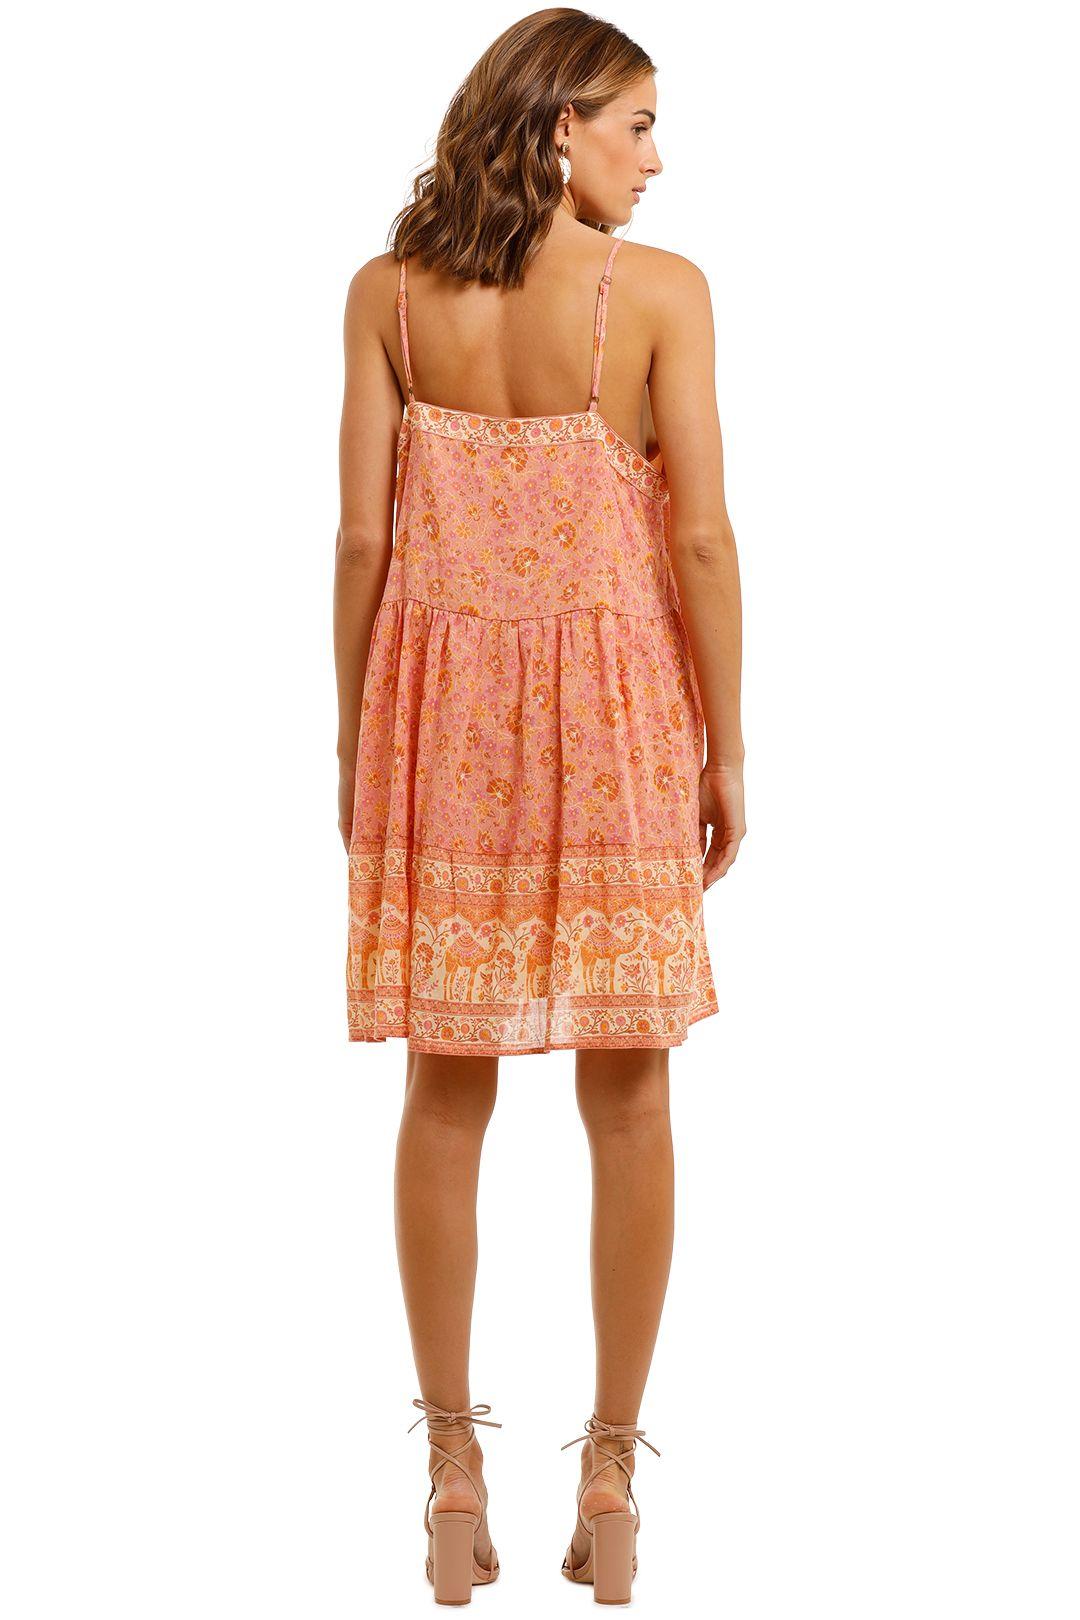 Spell Sundown Strappy Mini Dress Apricot Boho